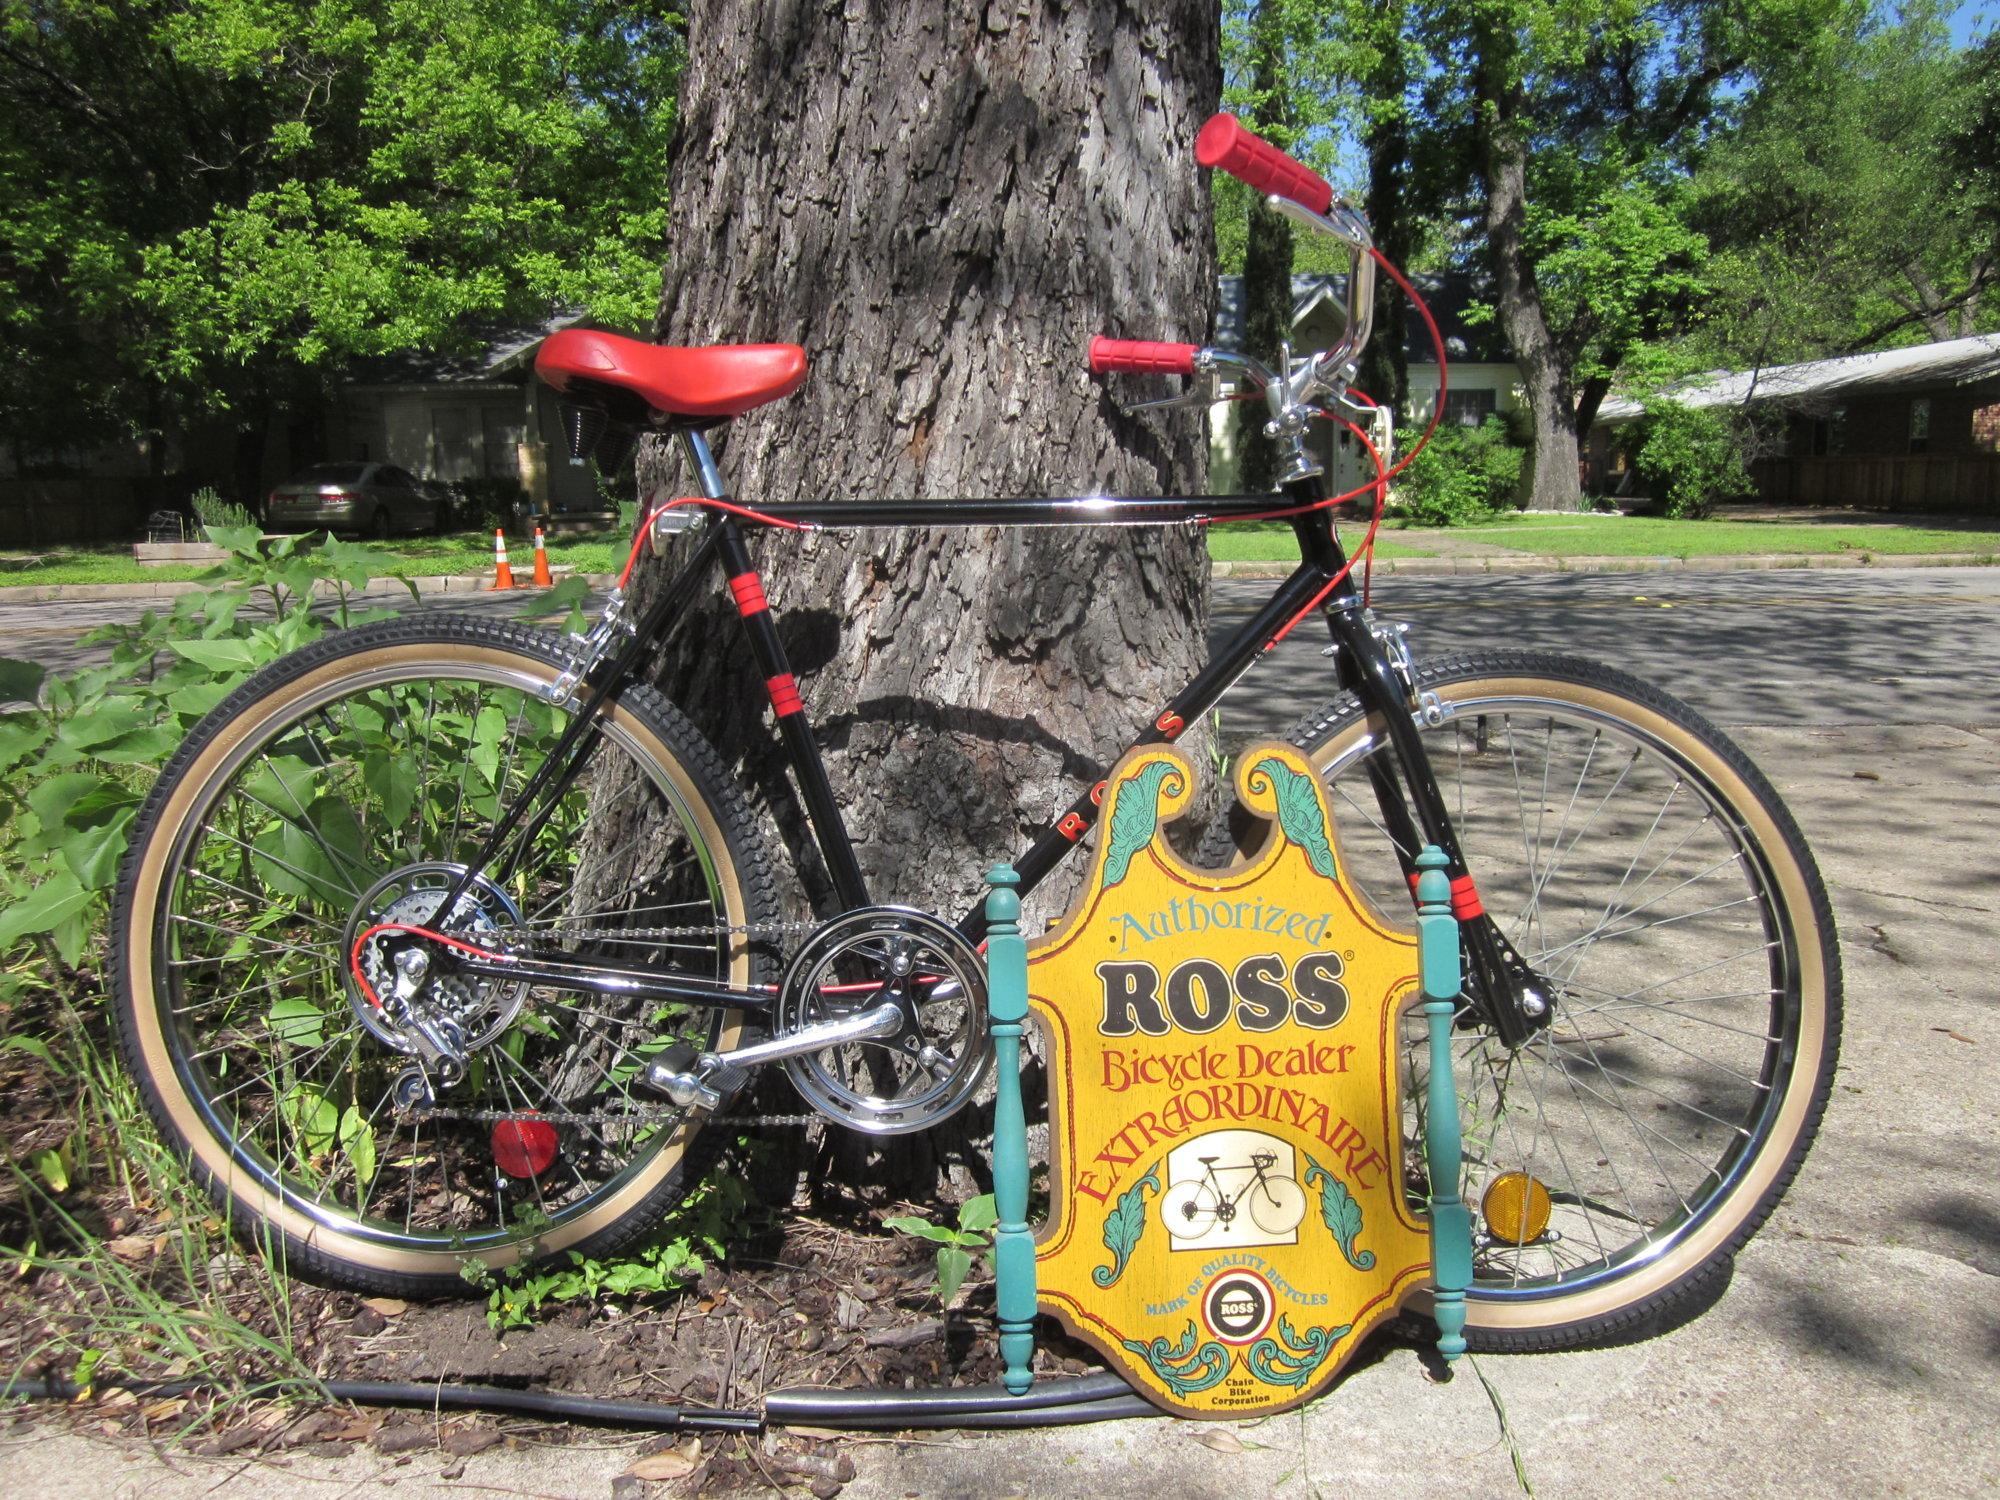 Ross Bike 024.JPG